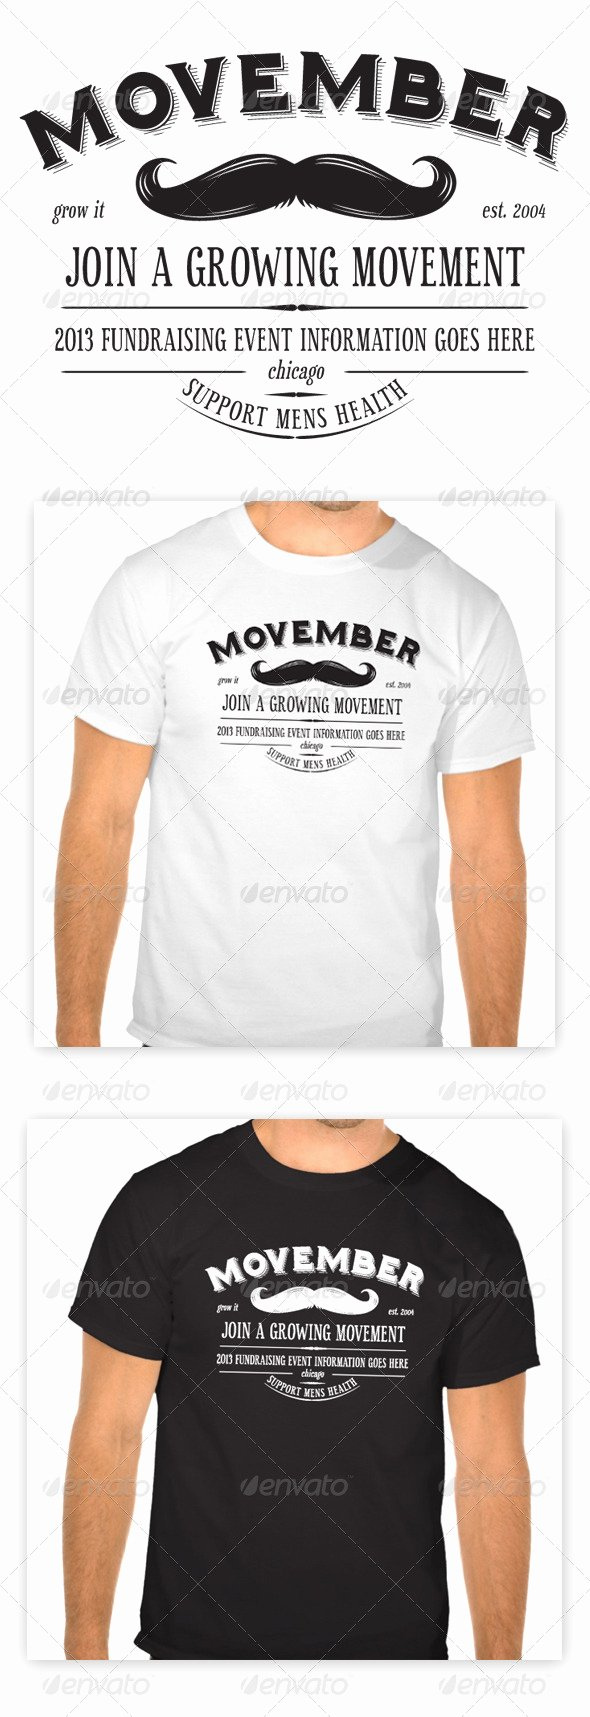 T Shirt Fundraiser Flyer Lovely Bbq Fundraiser Flyer Template Dondrup